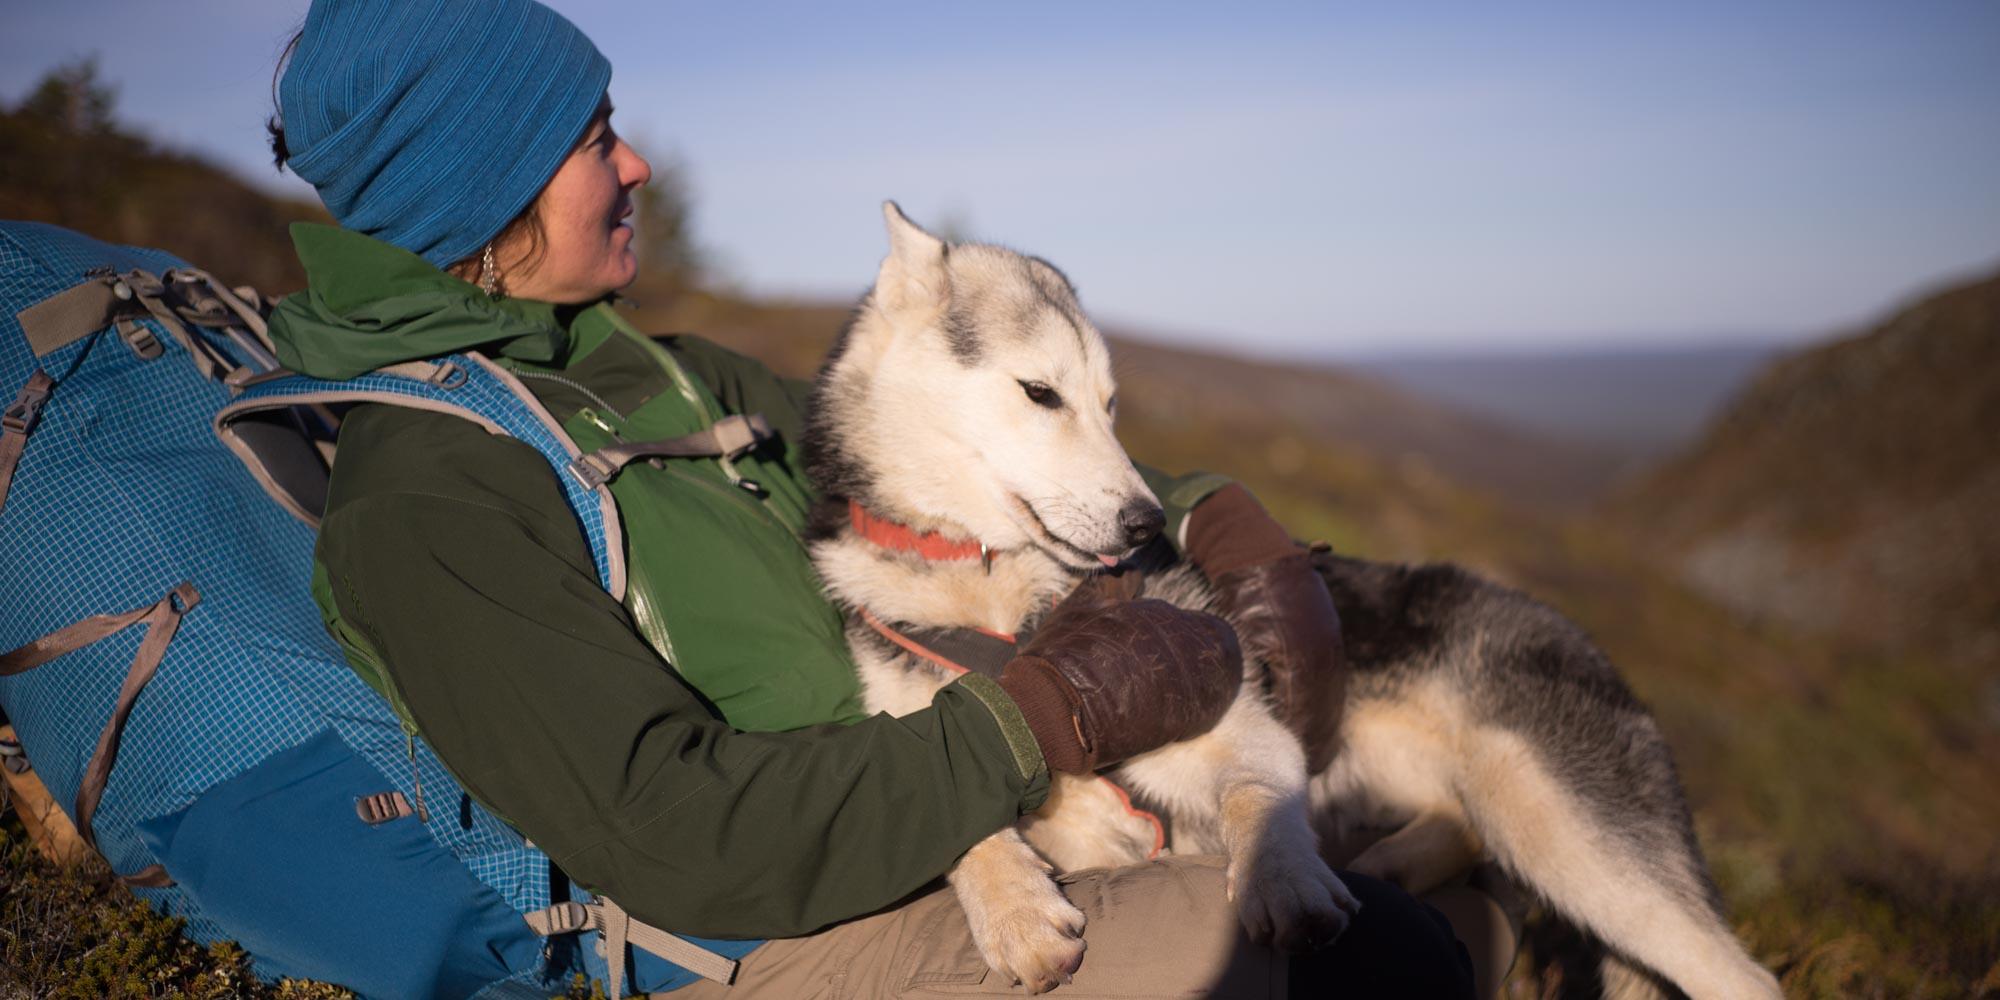 Husky Hike with Husky and Yoga Nature, Rovaniemi, Lapland, Finland